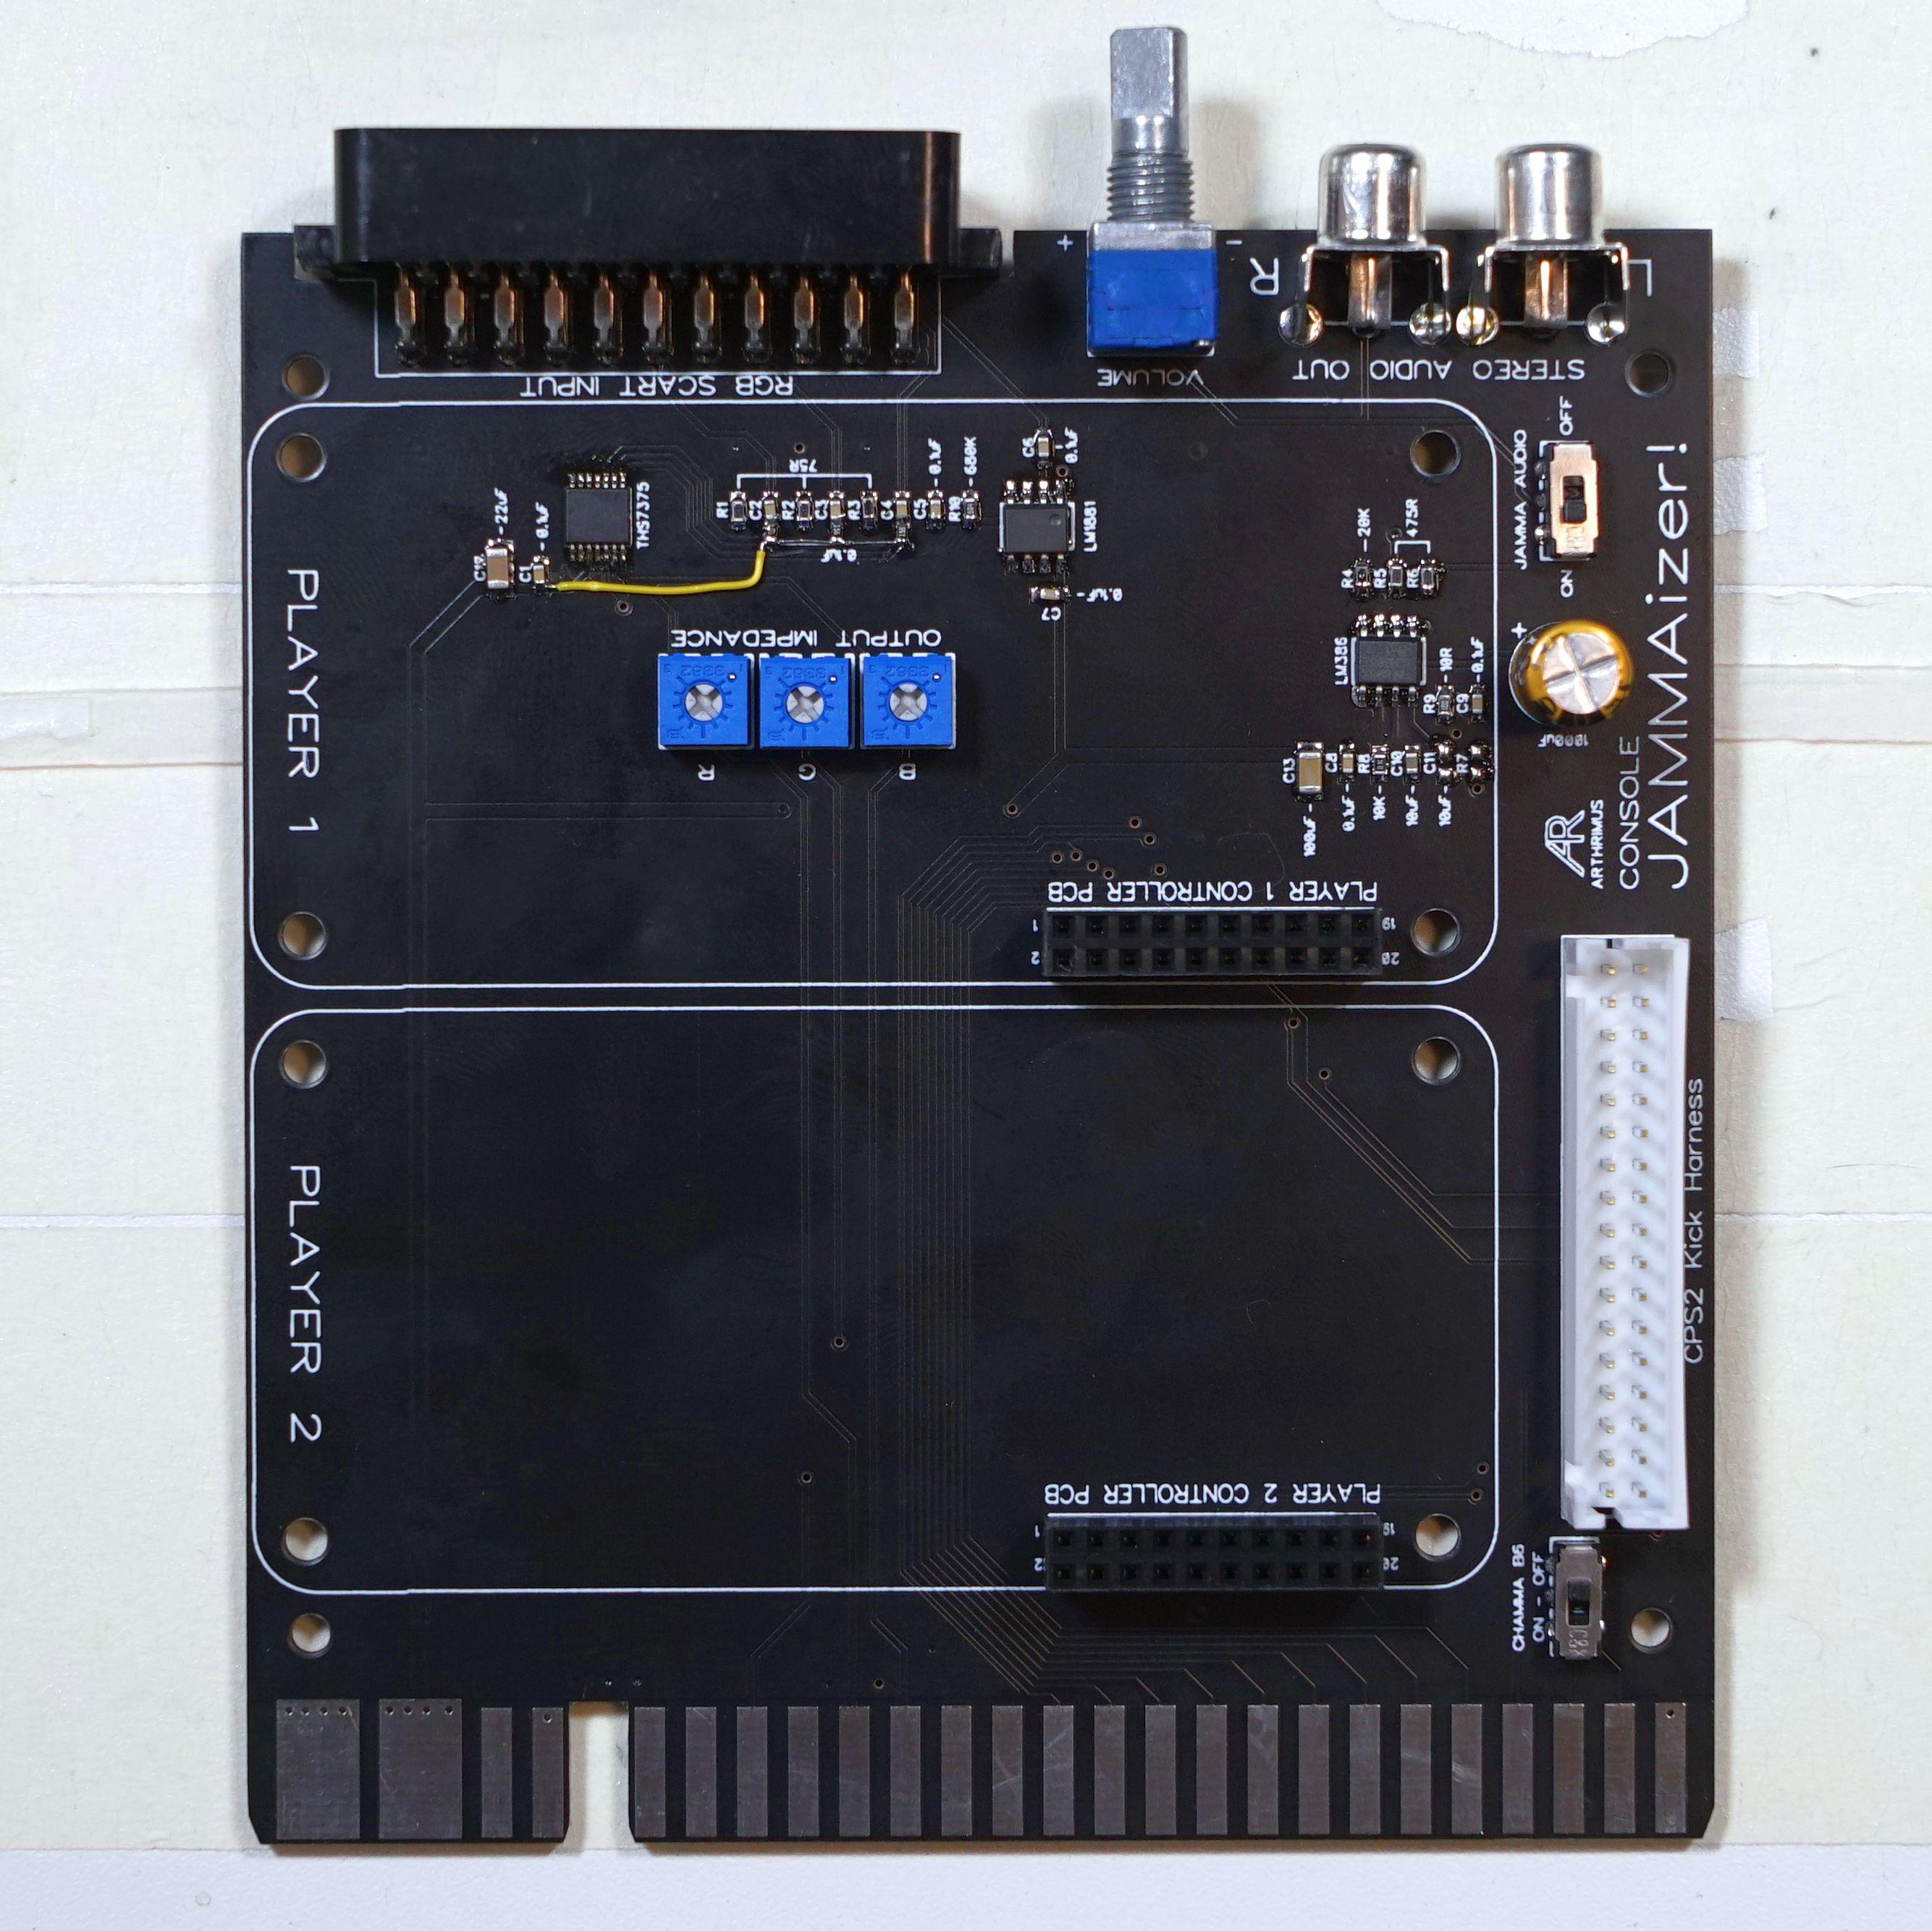 Console JAMMAizer by Arthrimus